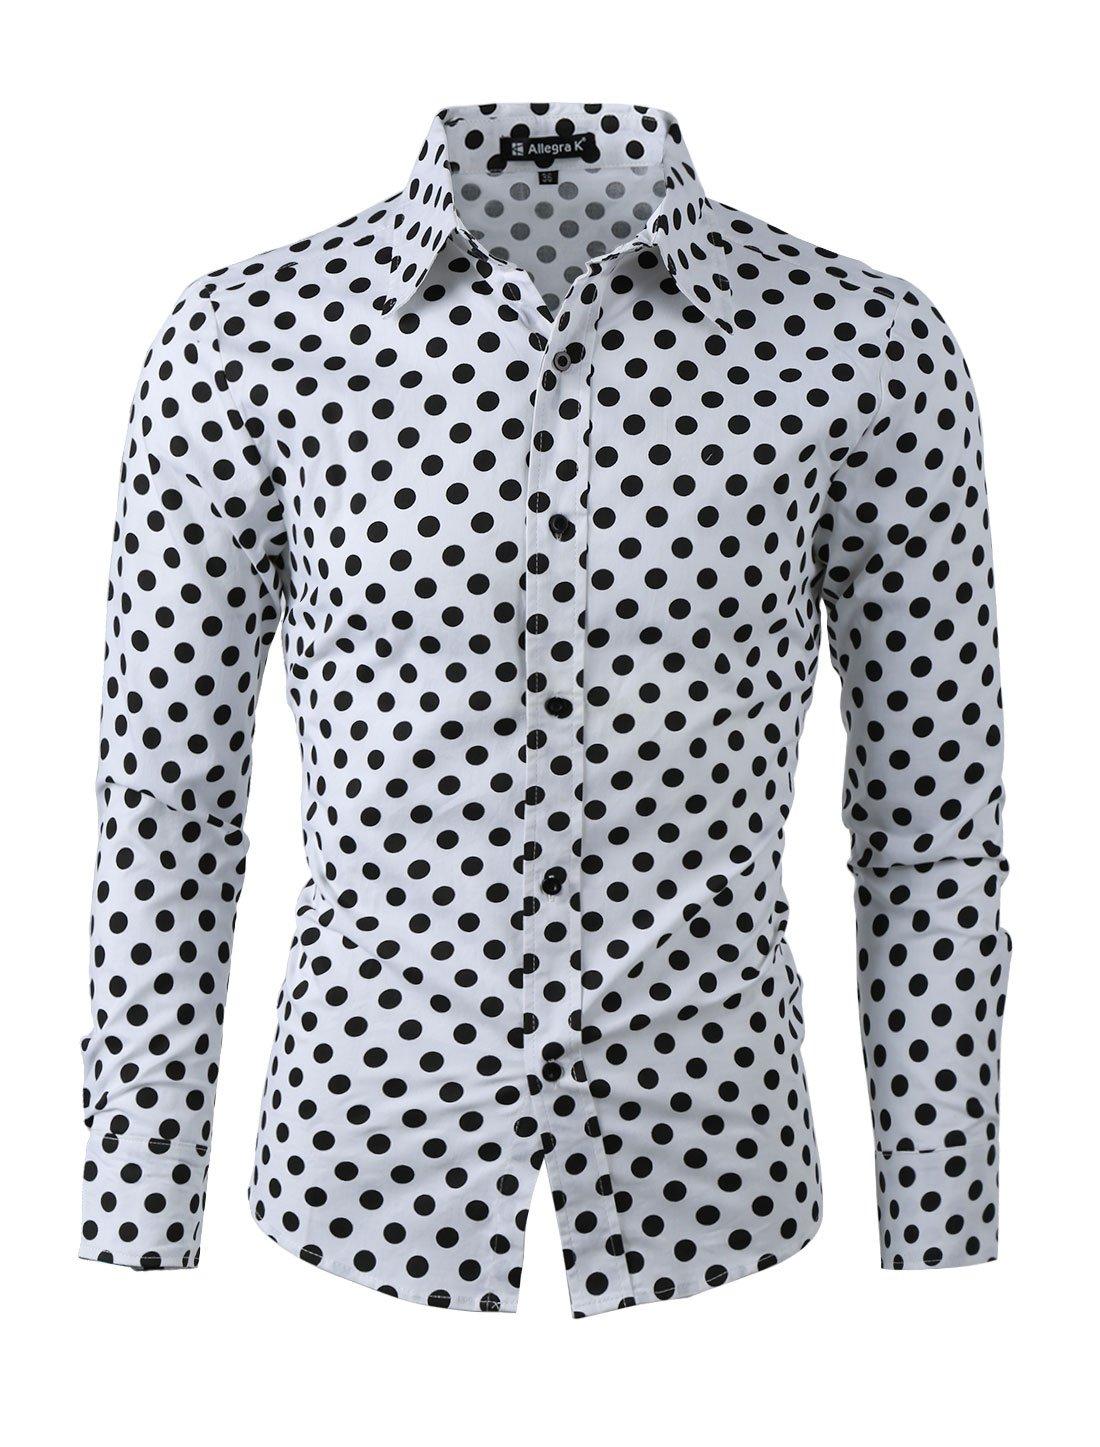 uxcell Men 100% Cotton Polka Dots Long Sleeve Slim Fit Dress Shirt g15041400ux0003